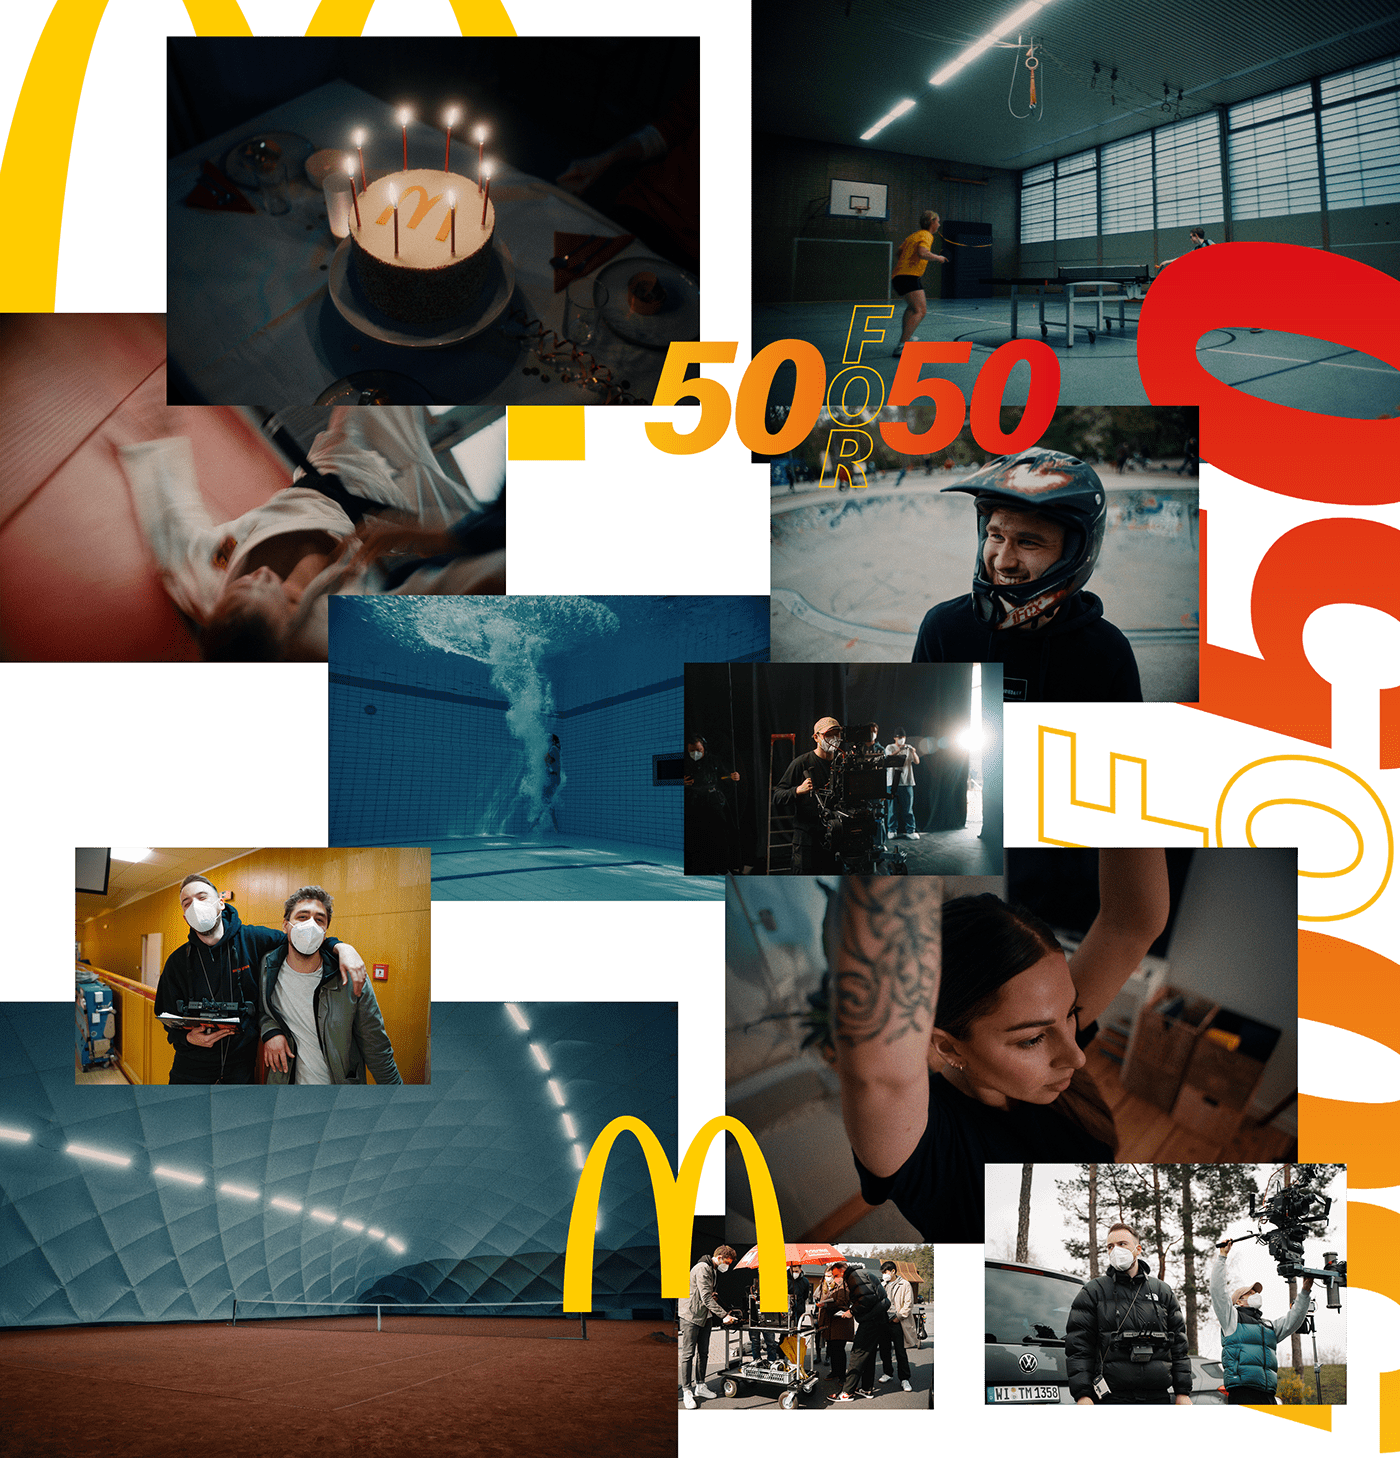 alexa Mini LF commercial direction director Film   Jung von Matt McDonalds regie video